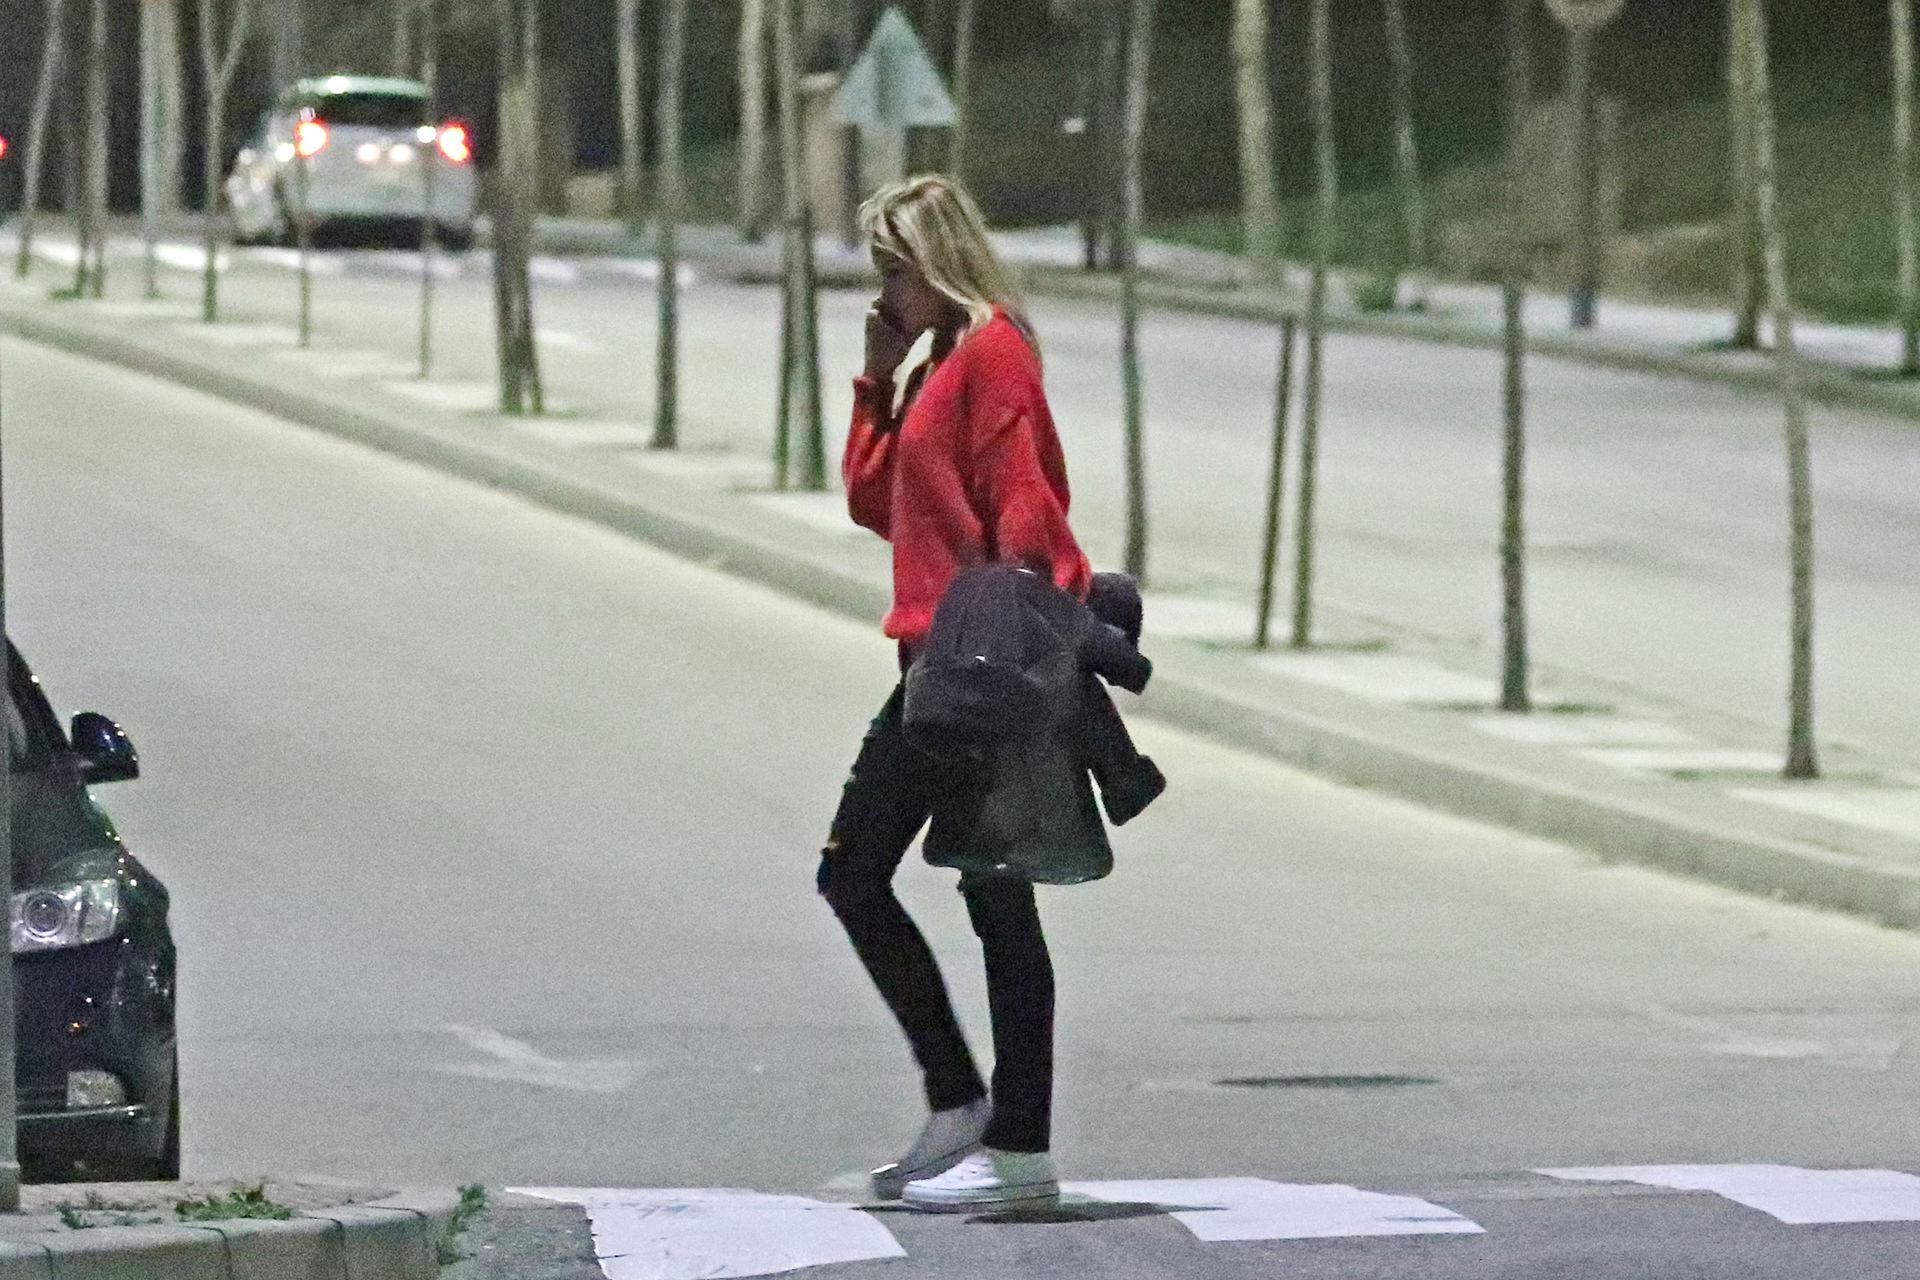 alba-carrillo-santi-burgoa-casa-1.jpg